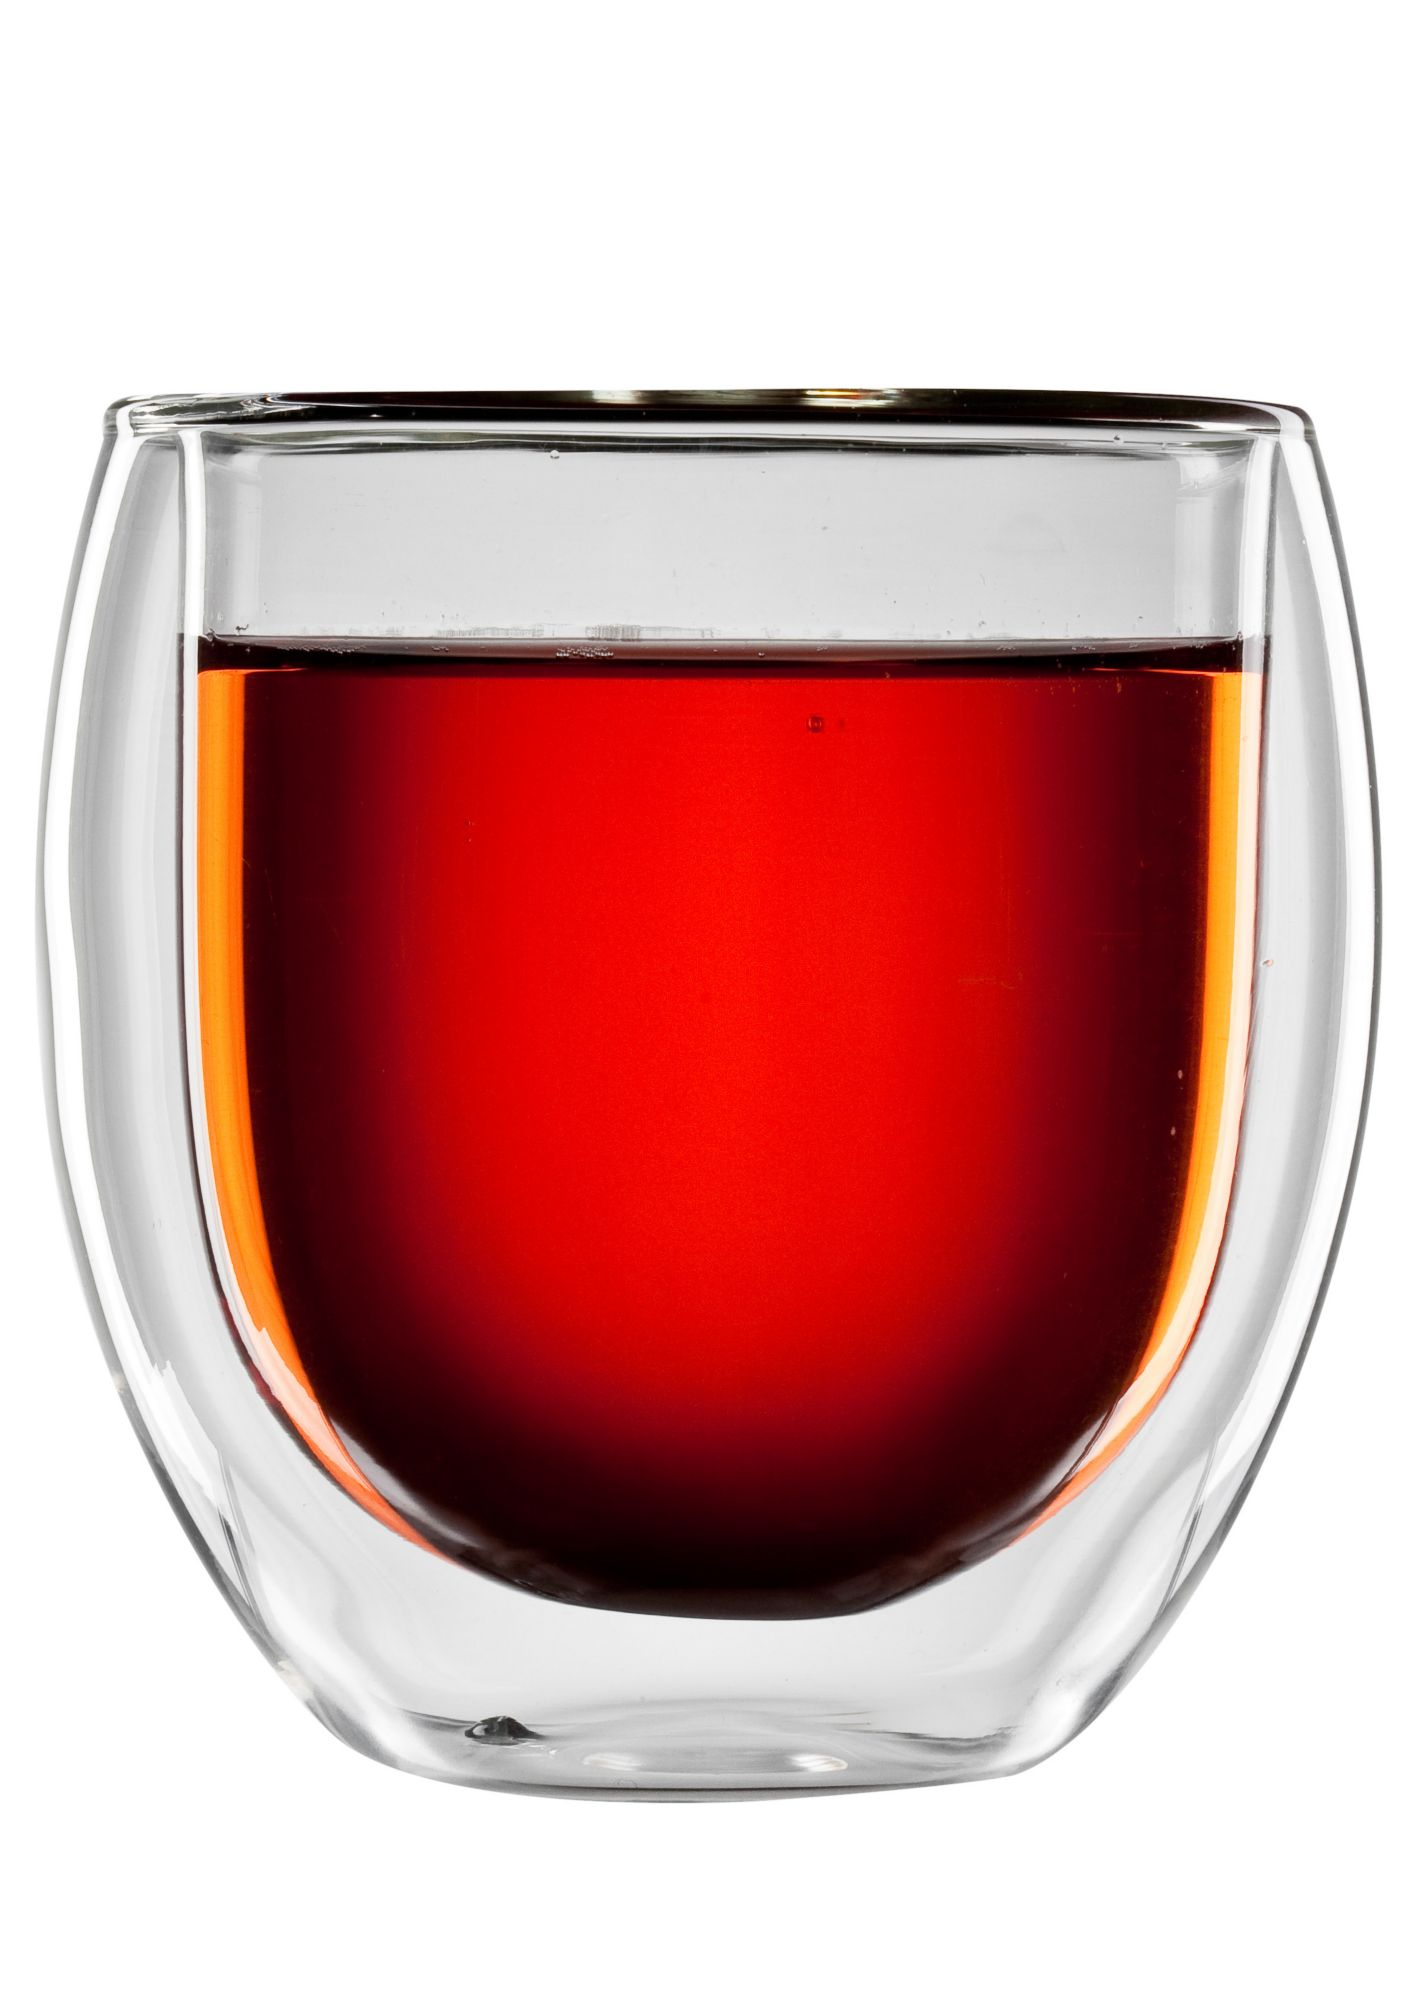 BLOOMIX bloomix Teeglas, 4er Set, »Tunis«, 400 ml